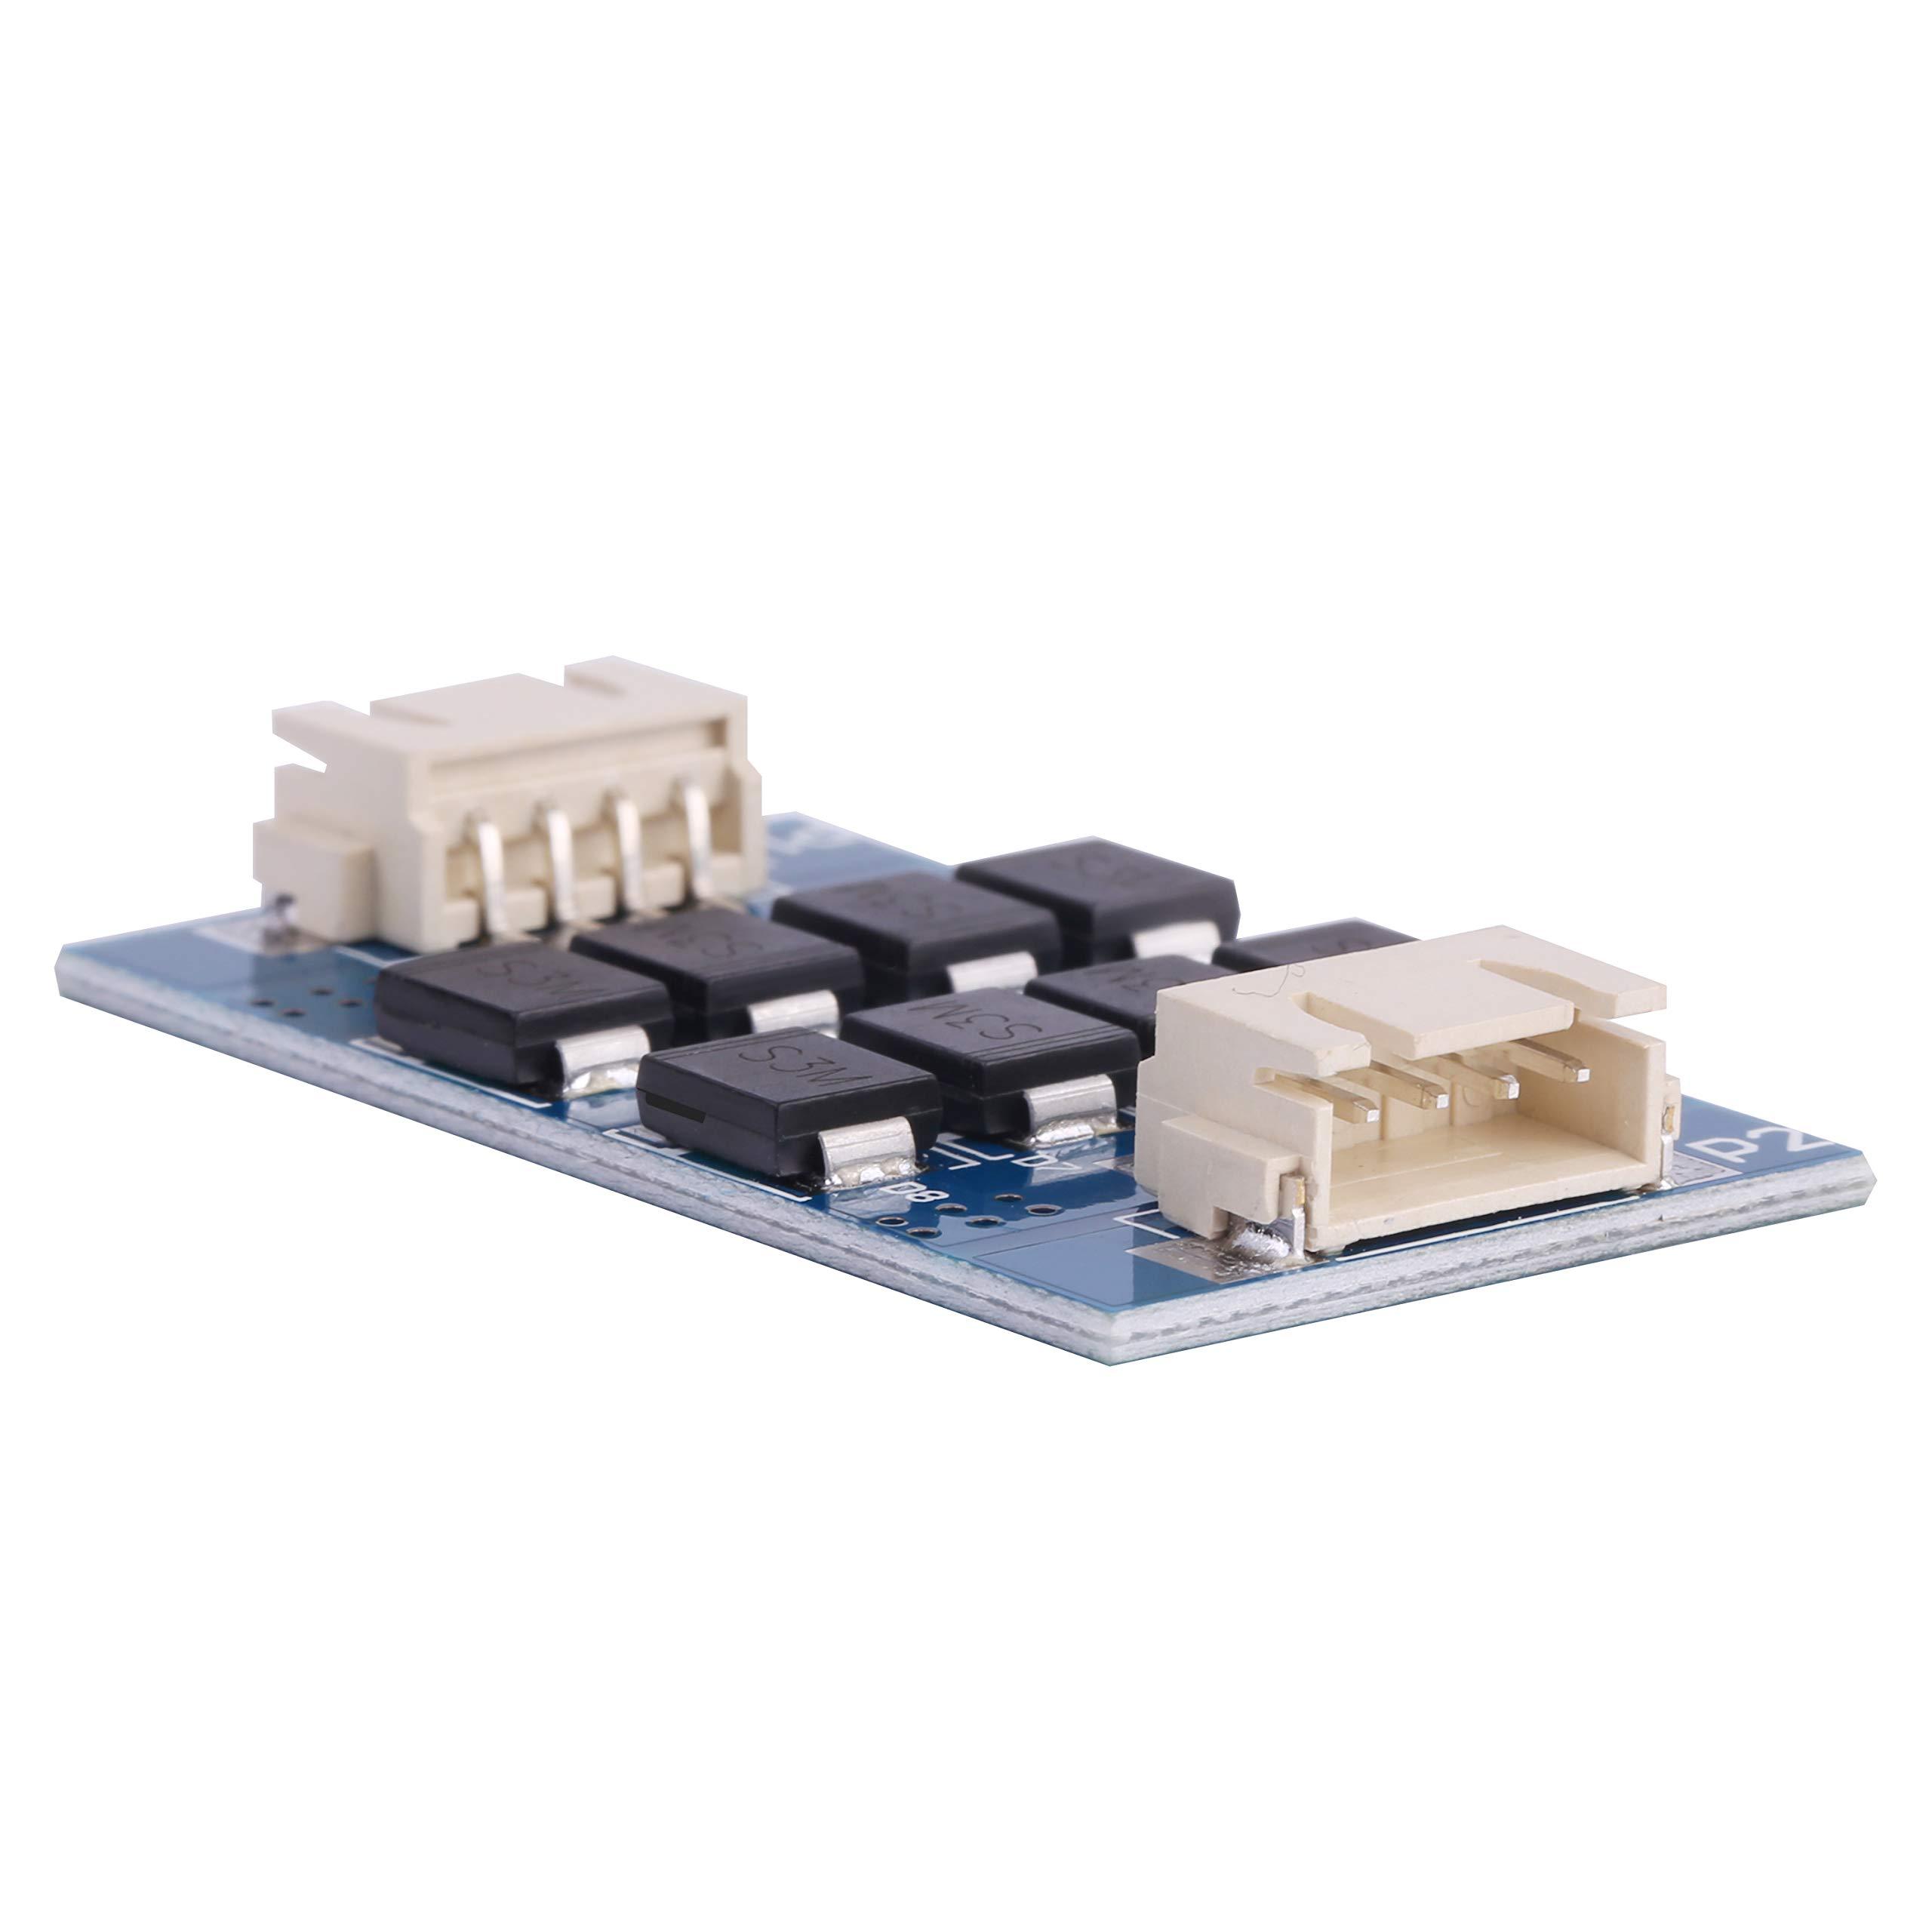 MakerHawk 4pcs TL-Smoother Module Heatsink with Du-pont Wire Kits for Pattern Elimination Motor Filter Clipping Filter 3D Printer Motor Drivers Terminator Reprap MK8 I3 Assembled